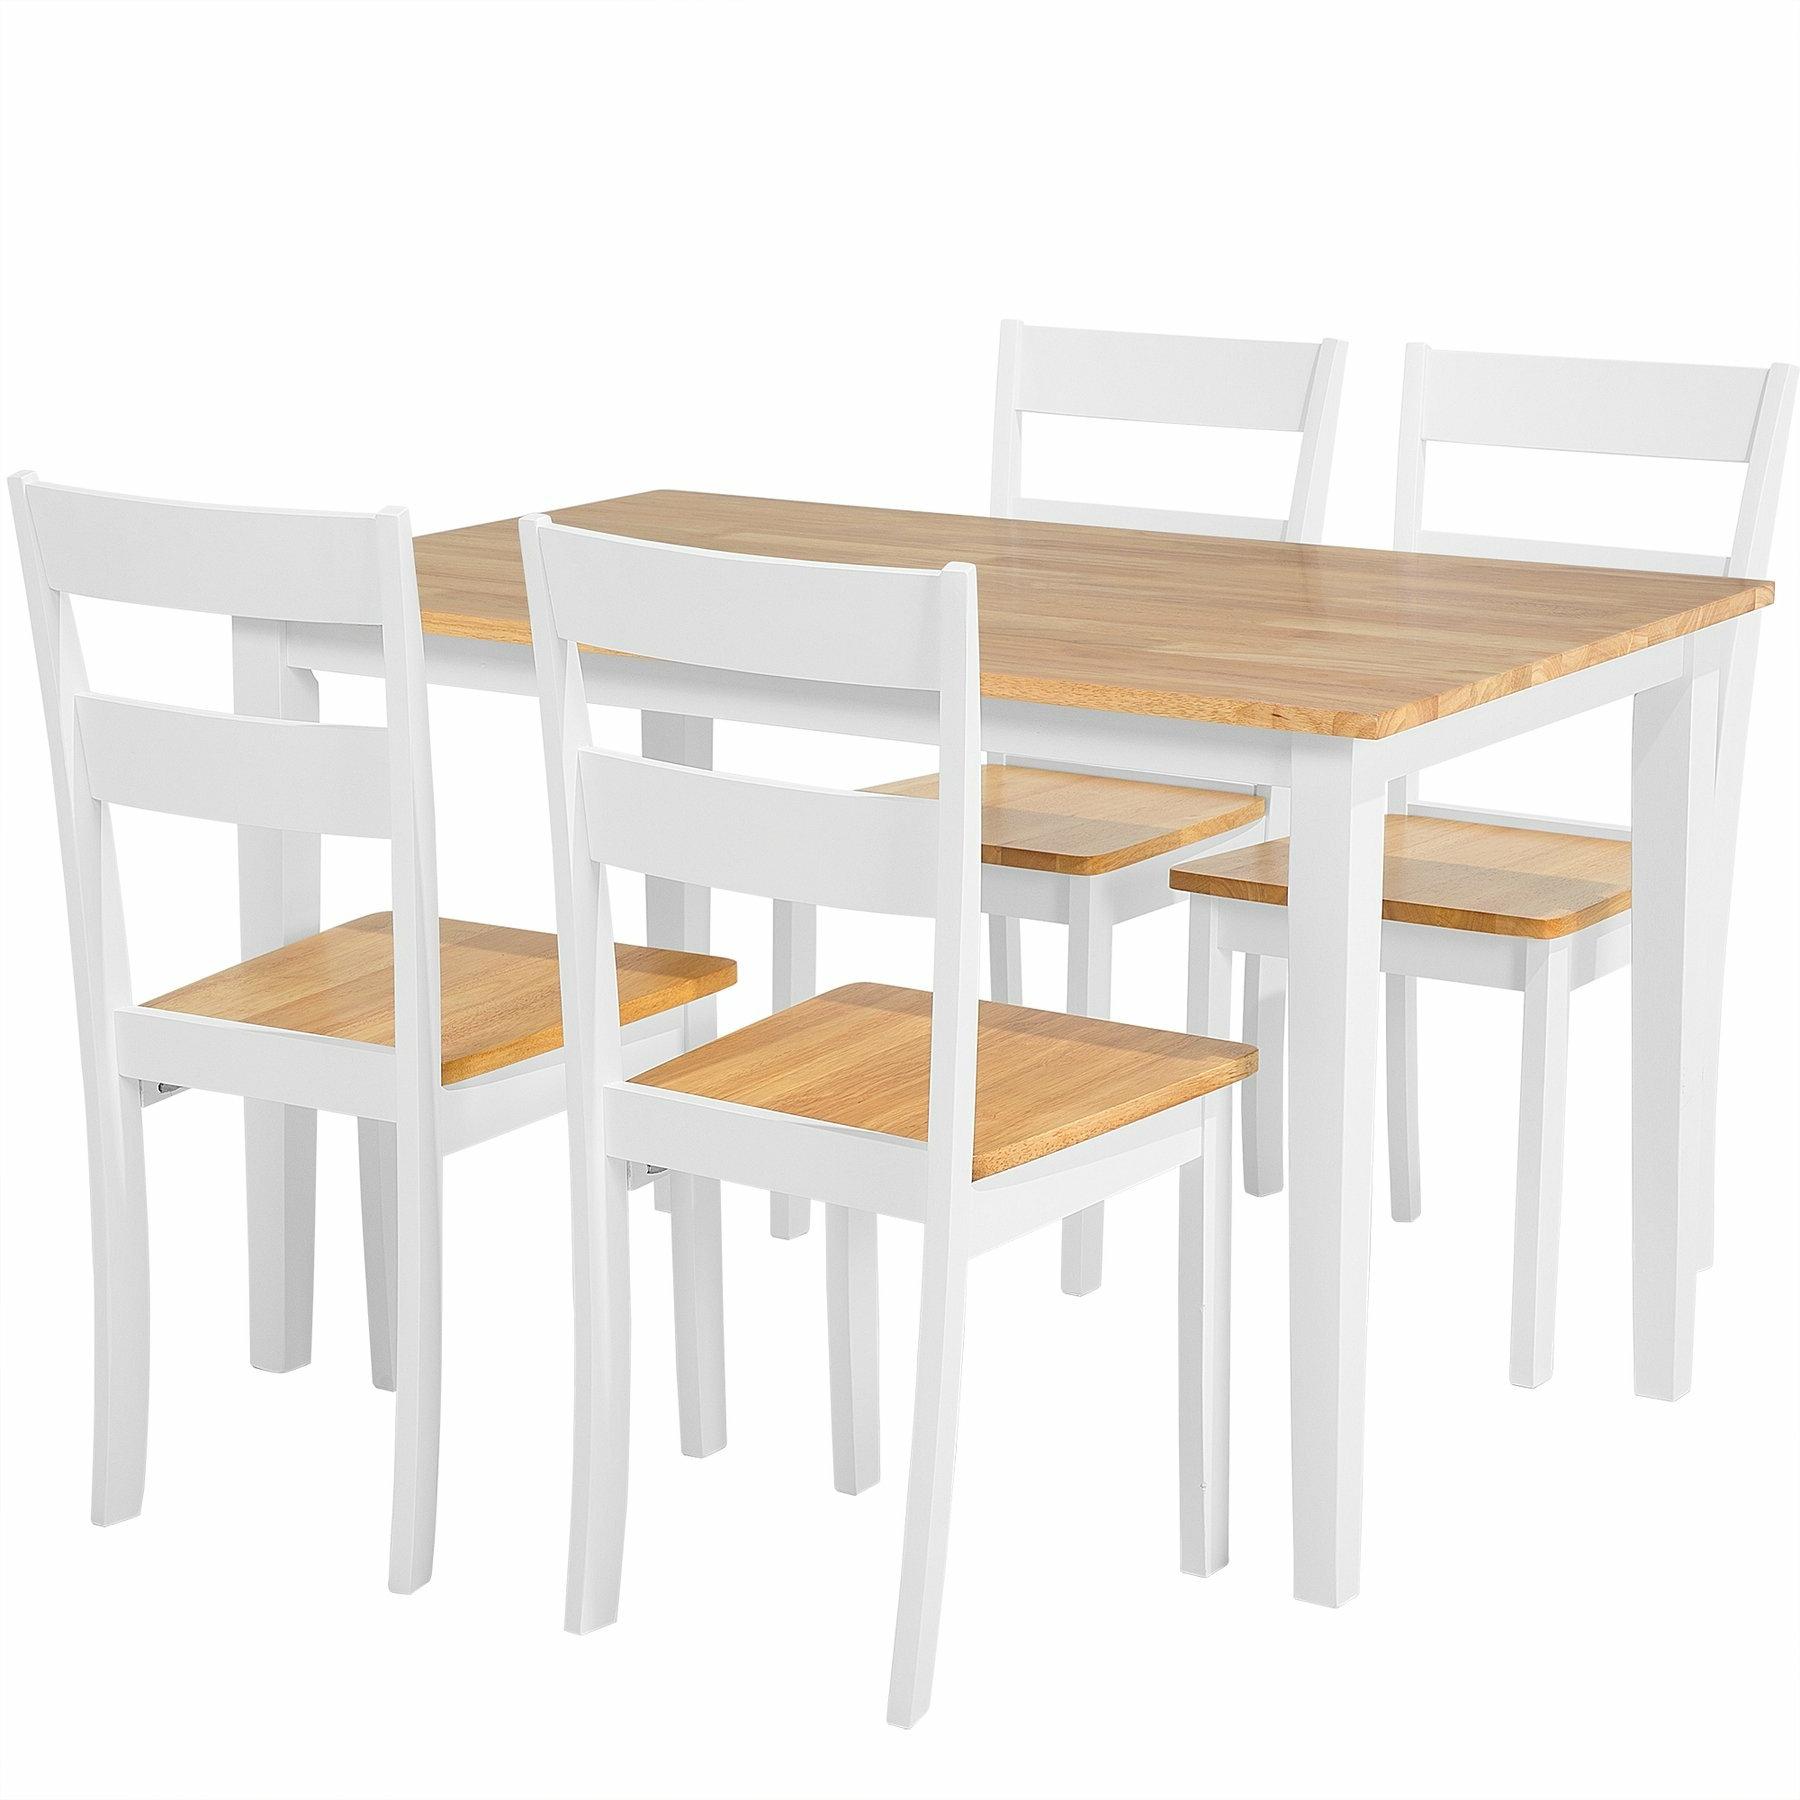 Trendy Sundberg 5 Piece Solid Wood Dining Sets Regarding Seabrook 5 Piece Solid Wood Dining Set (Gallery 9 of 20)